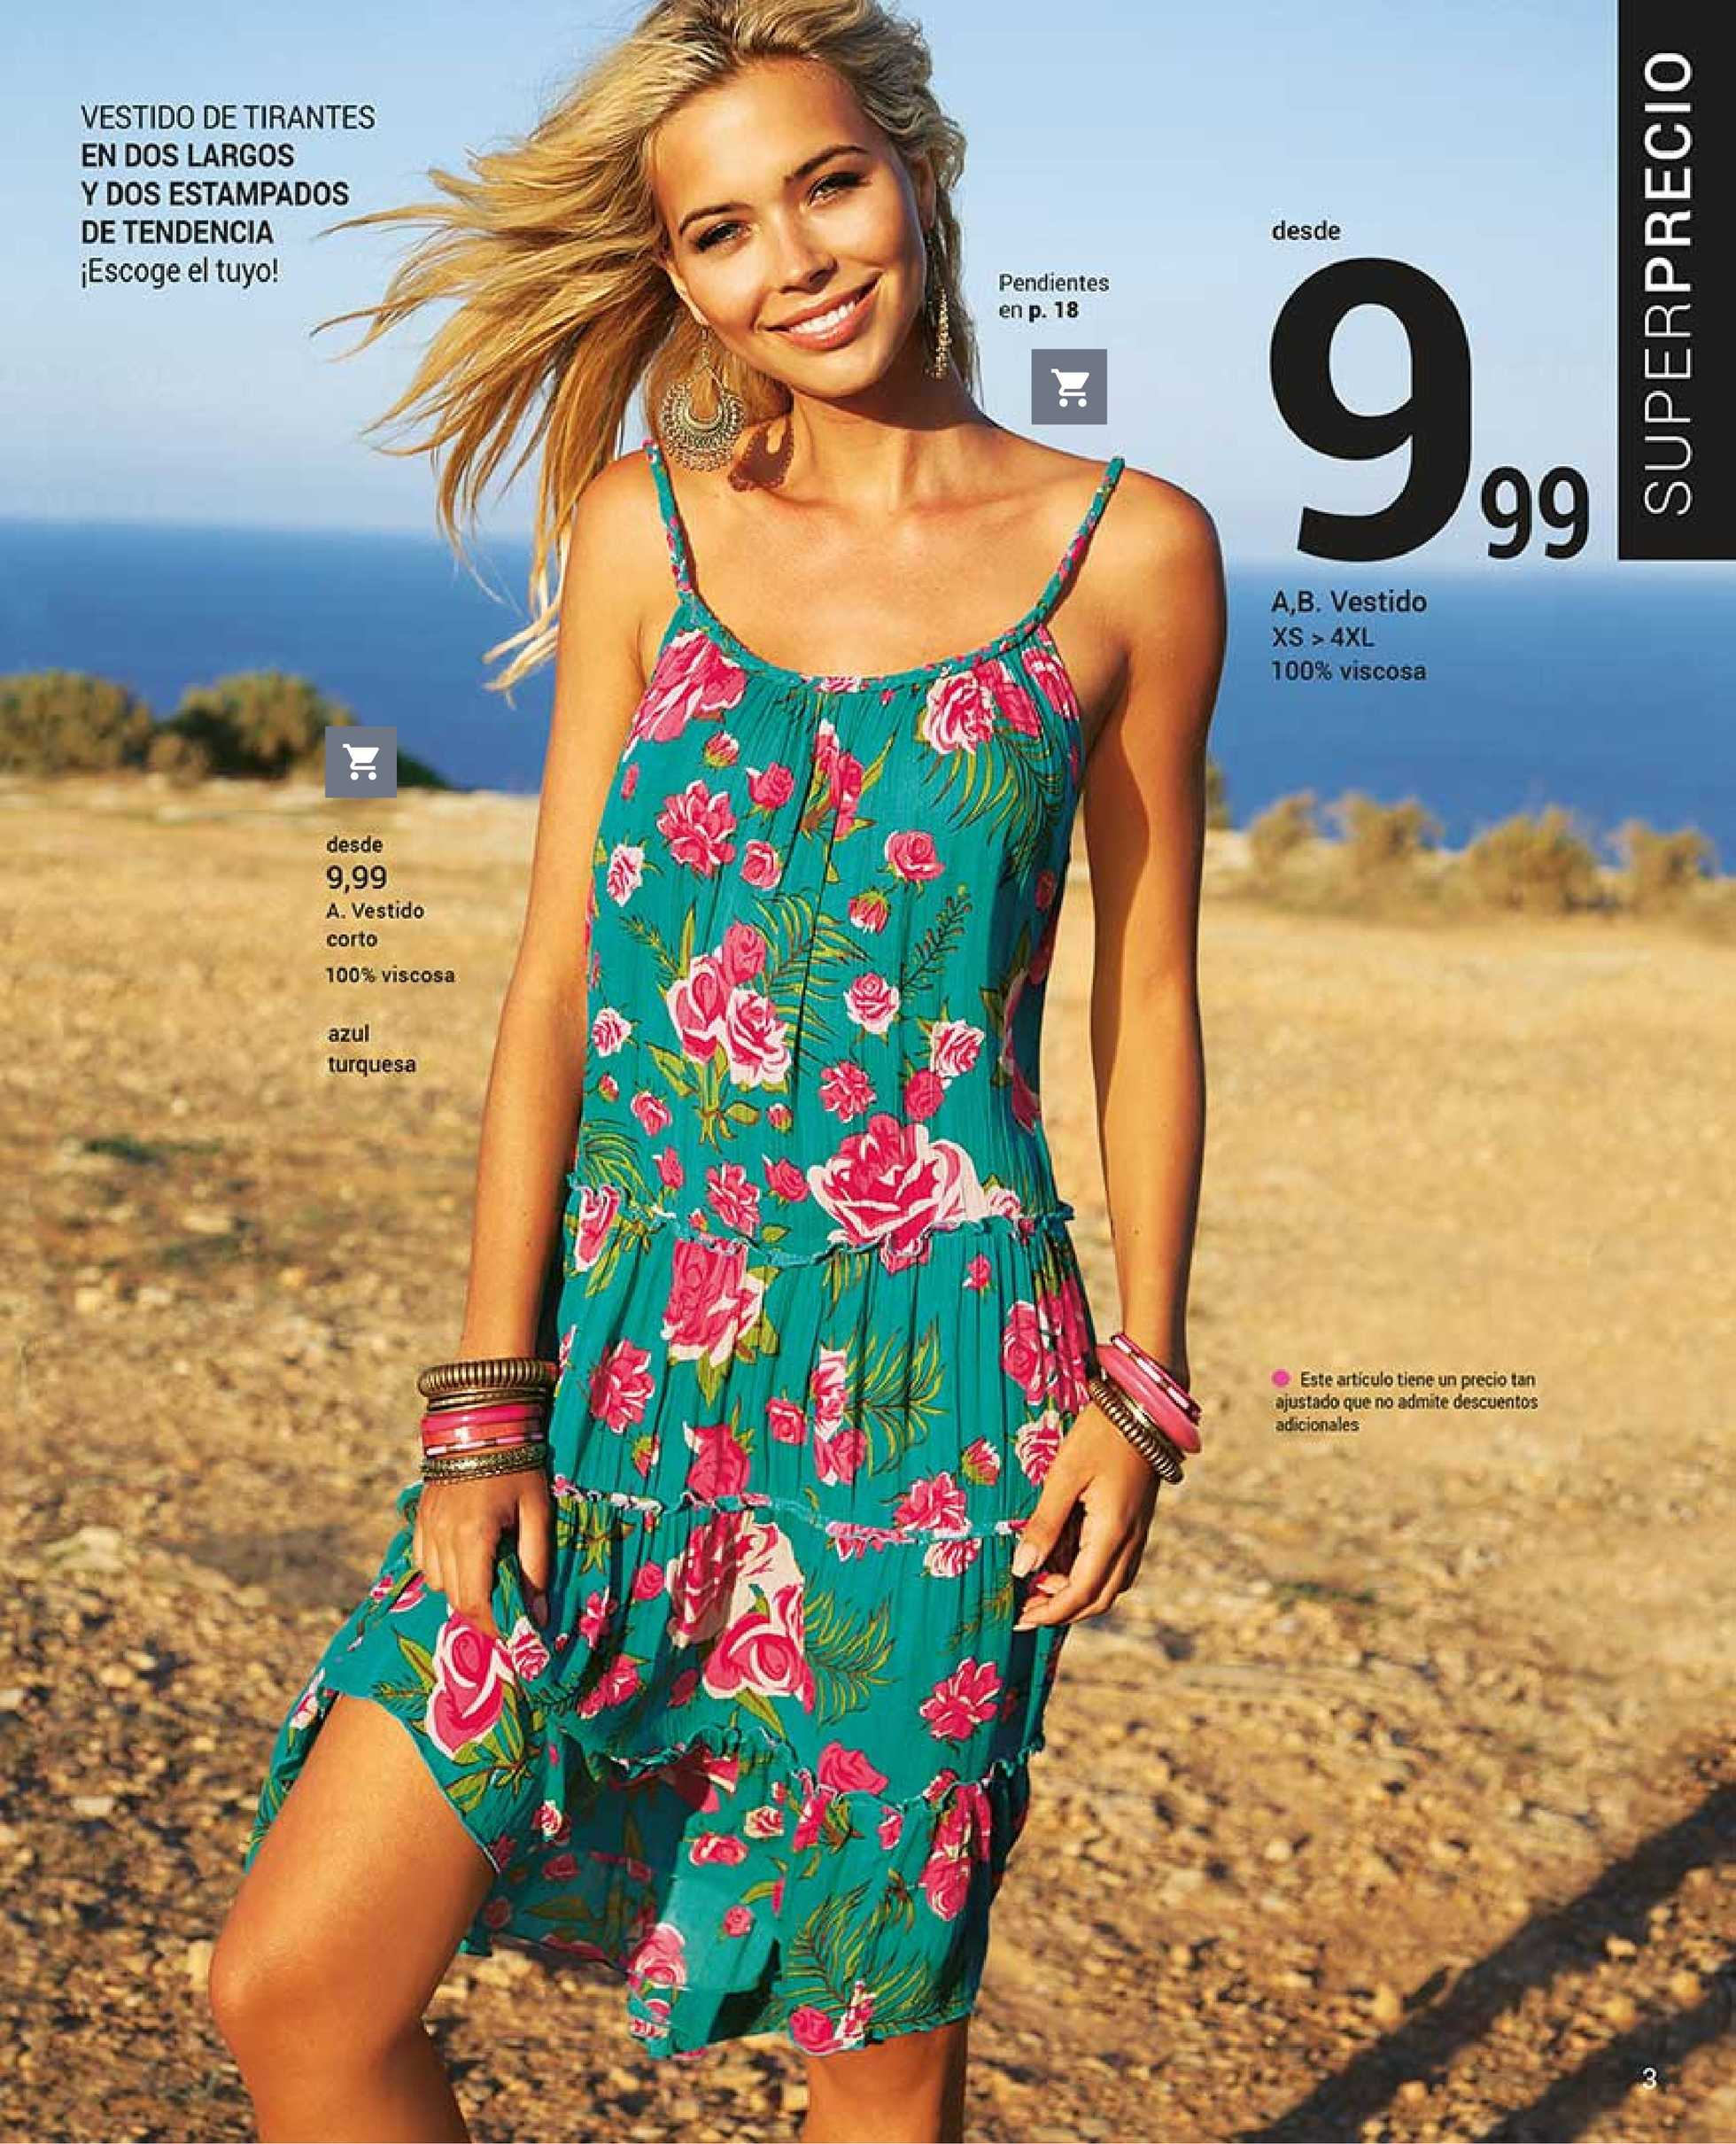 c092cc7a721 Venca - NEWSPAPERS_singleNewspaper_alt_presentationSliderItem_startAt  2019-06-01 - página 3